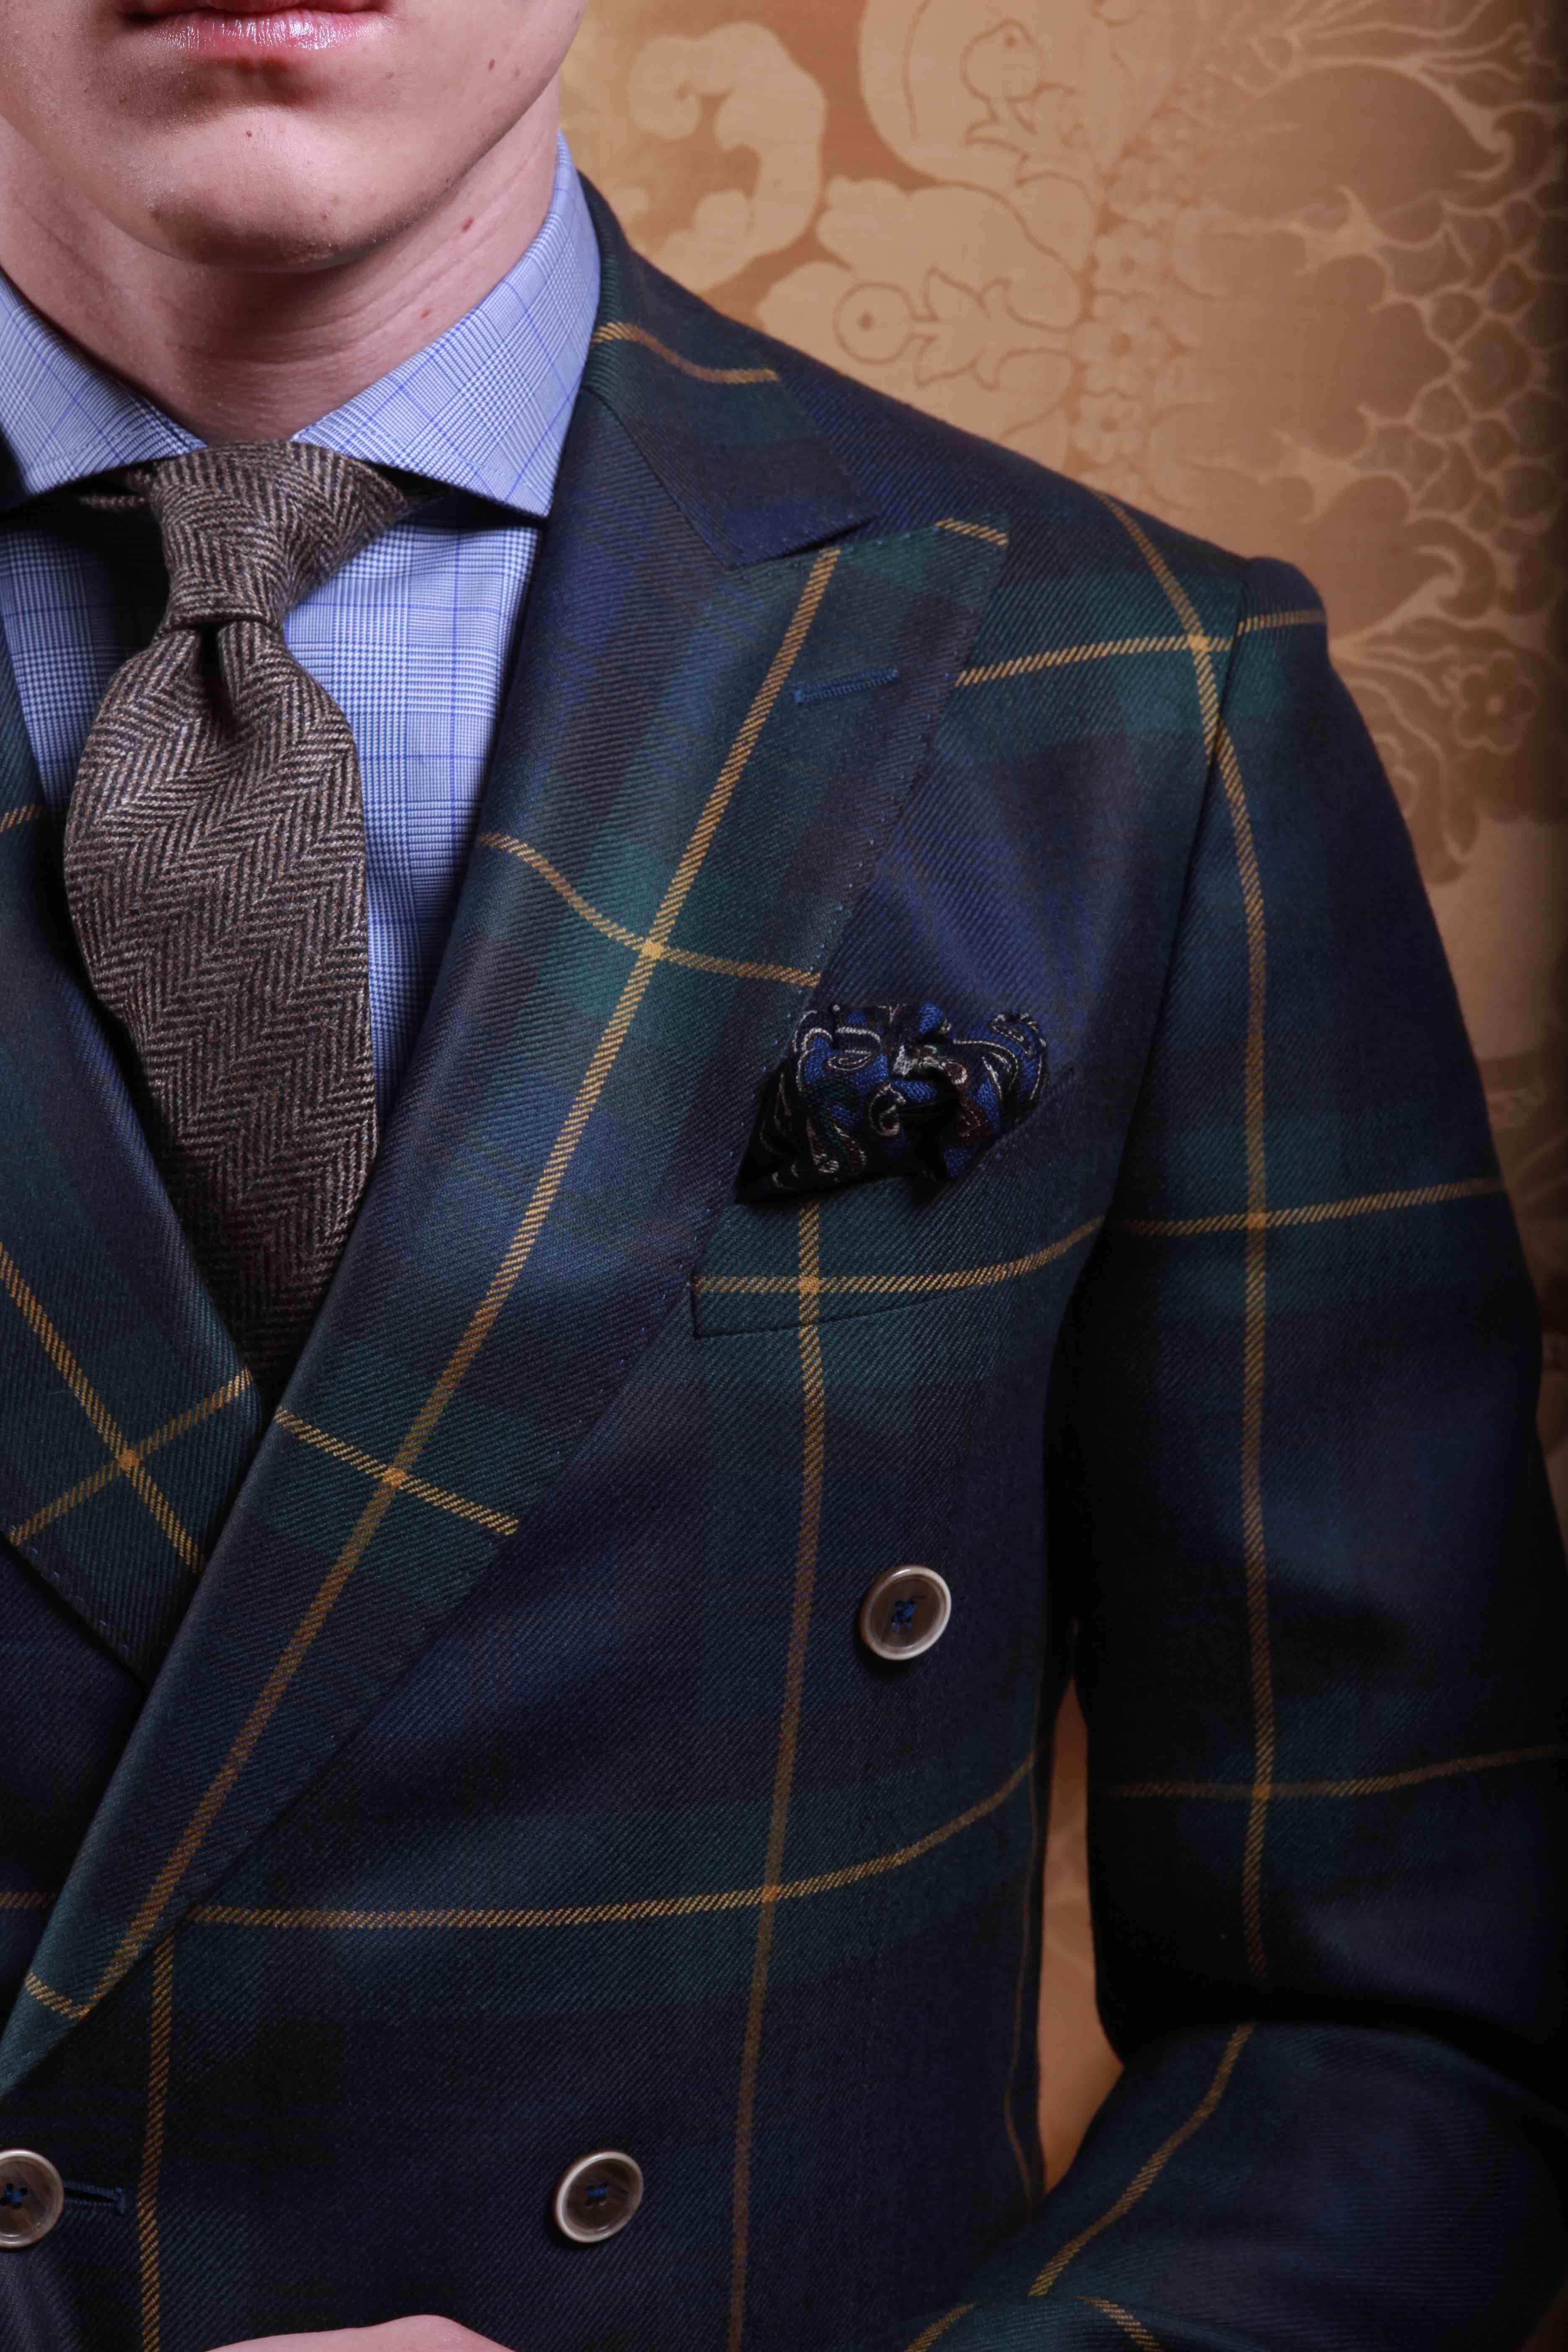 veste crois e 6 boutons en laine vierge motif tartan wicketsobritish lord wallington. Black Bedroom Furniture Sets. Home Design Ideas